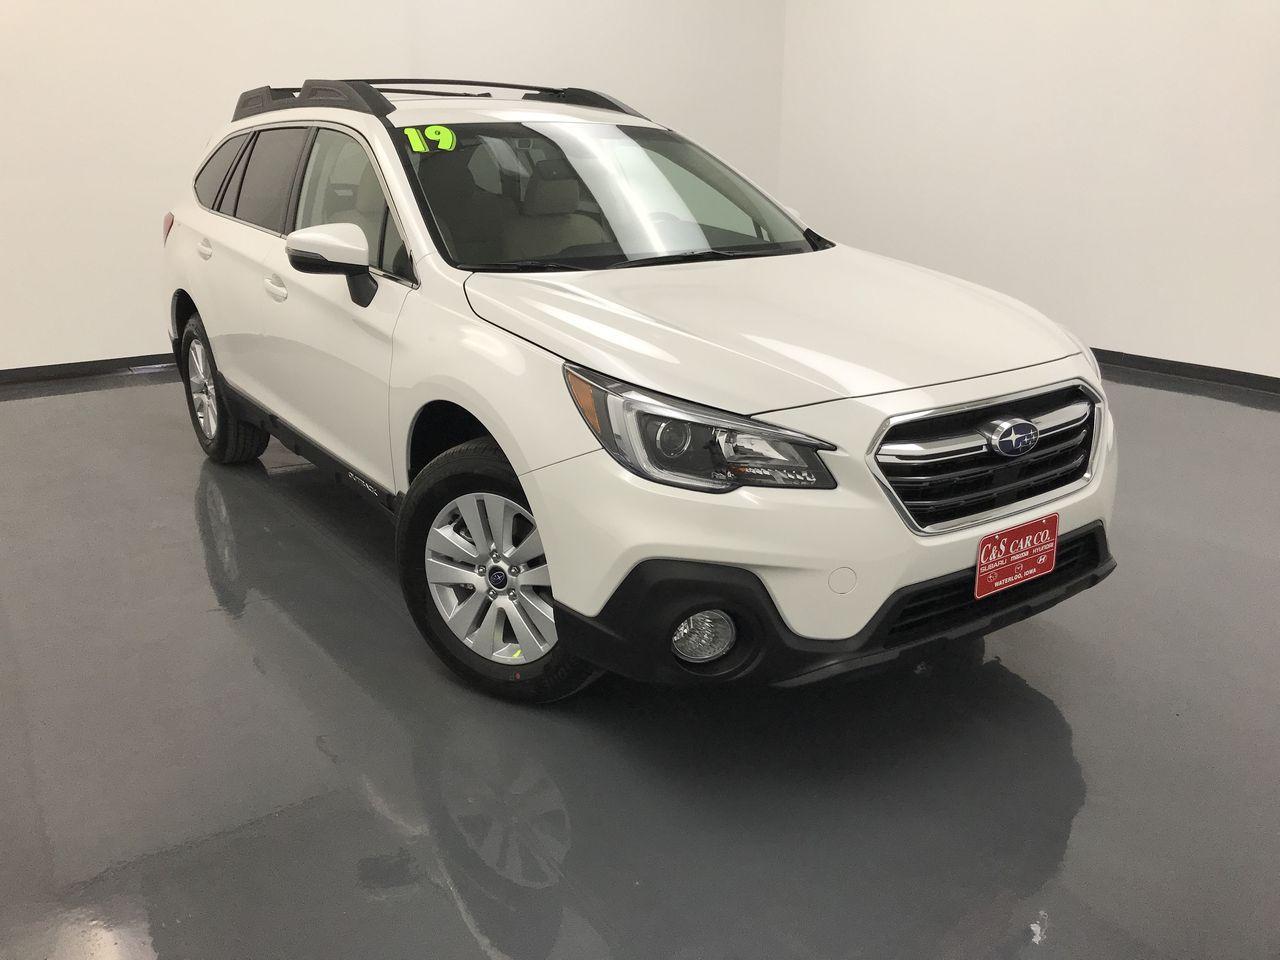 2019 Subaru Outback 2.5i Premium W/Eyesight